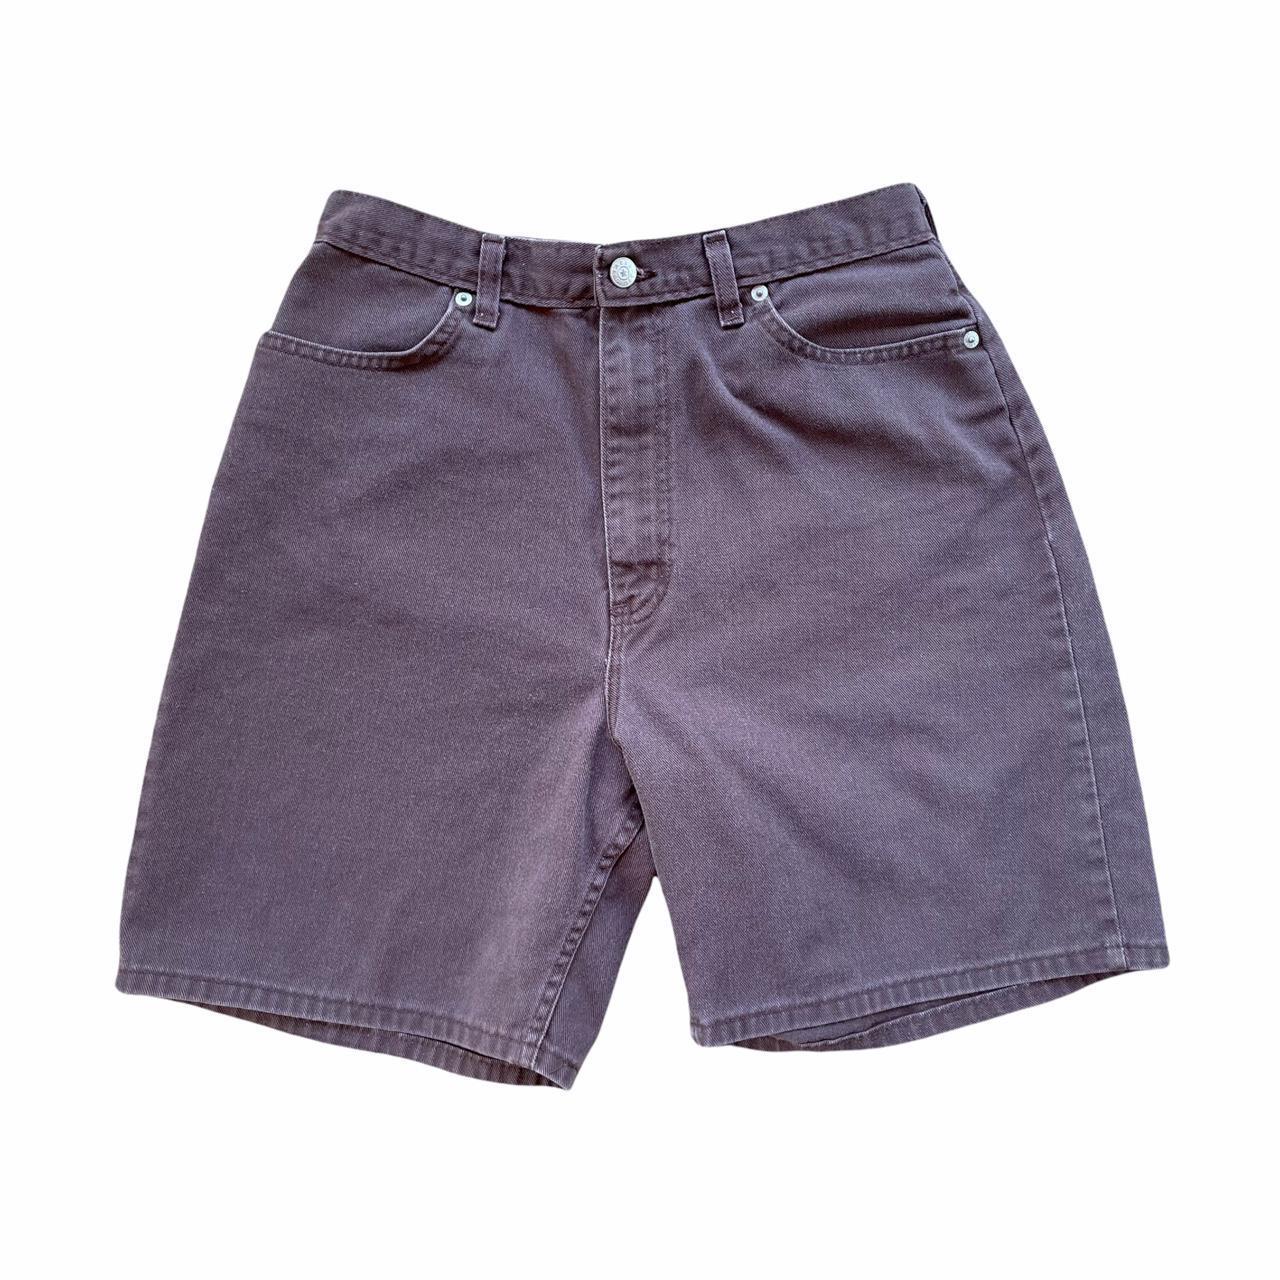 Product Image 1 - Vintage brown longline denim shorts.